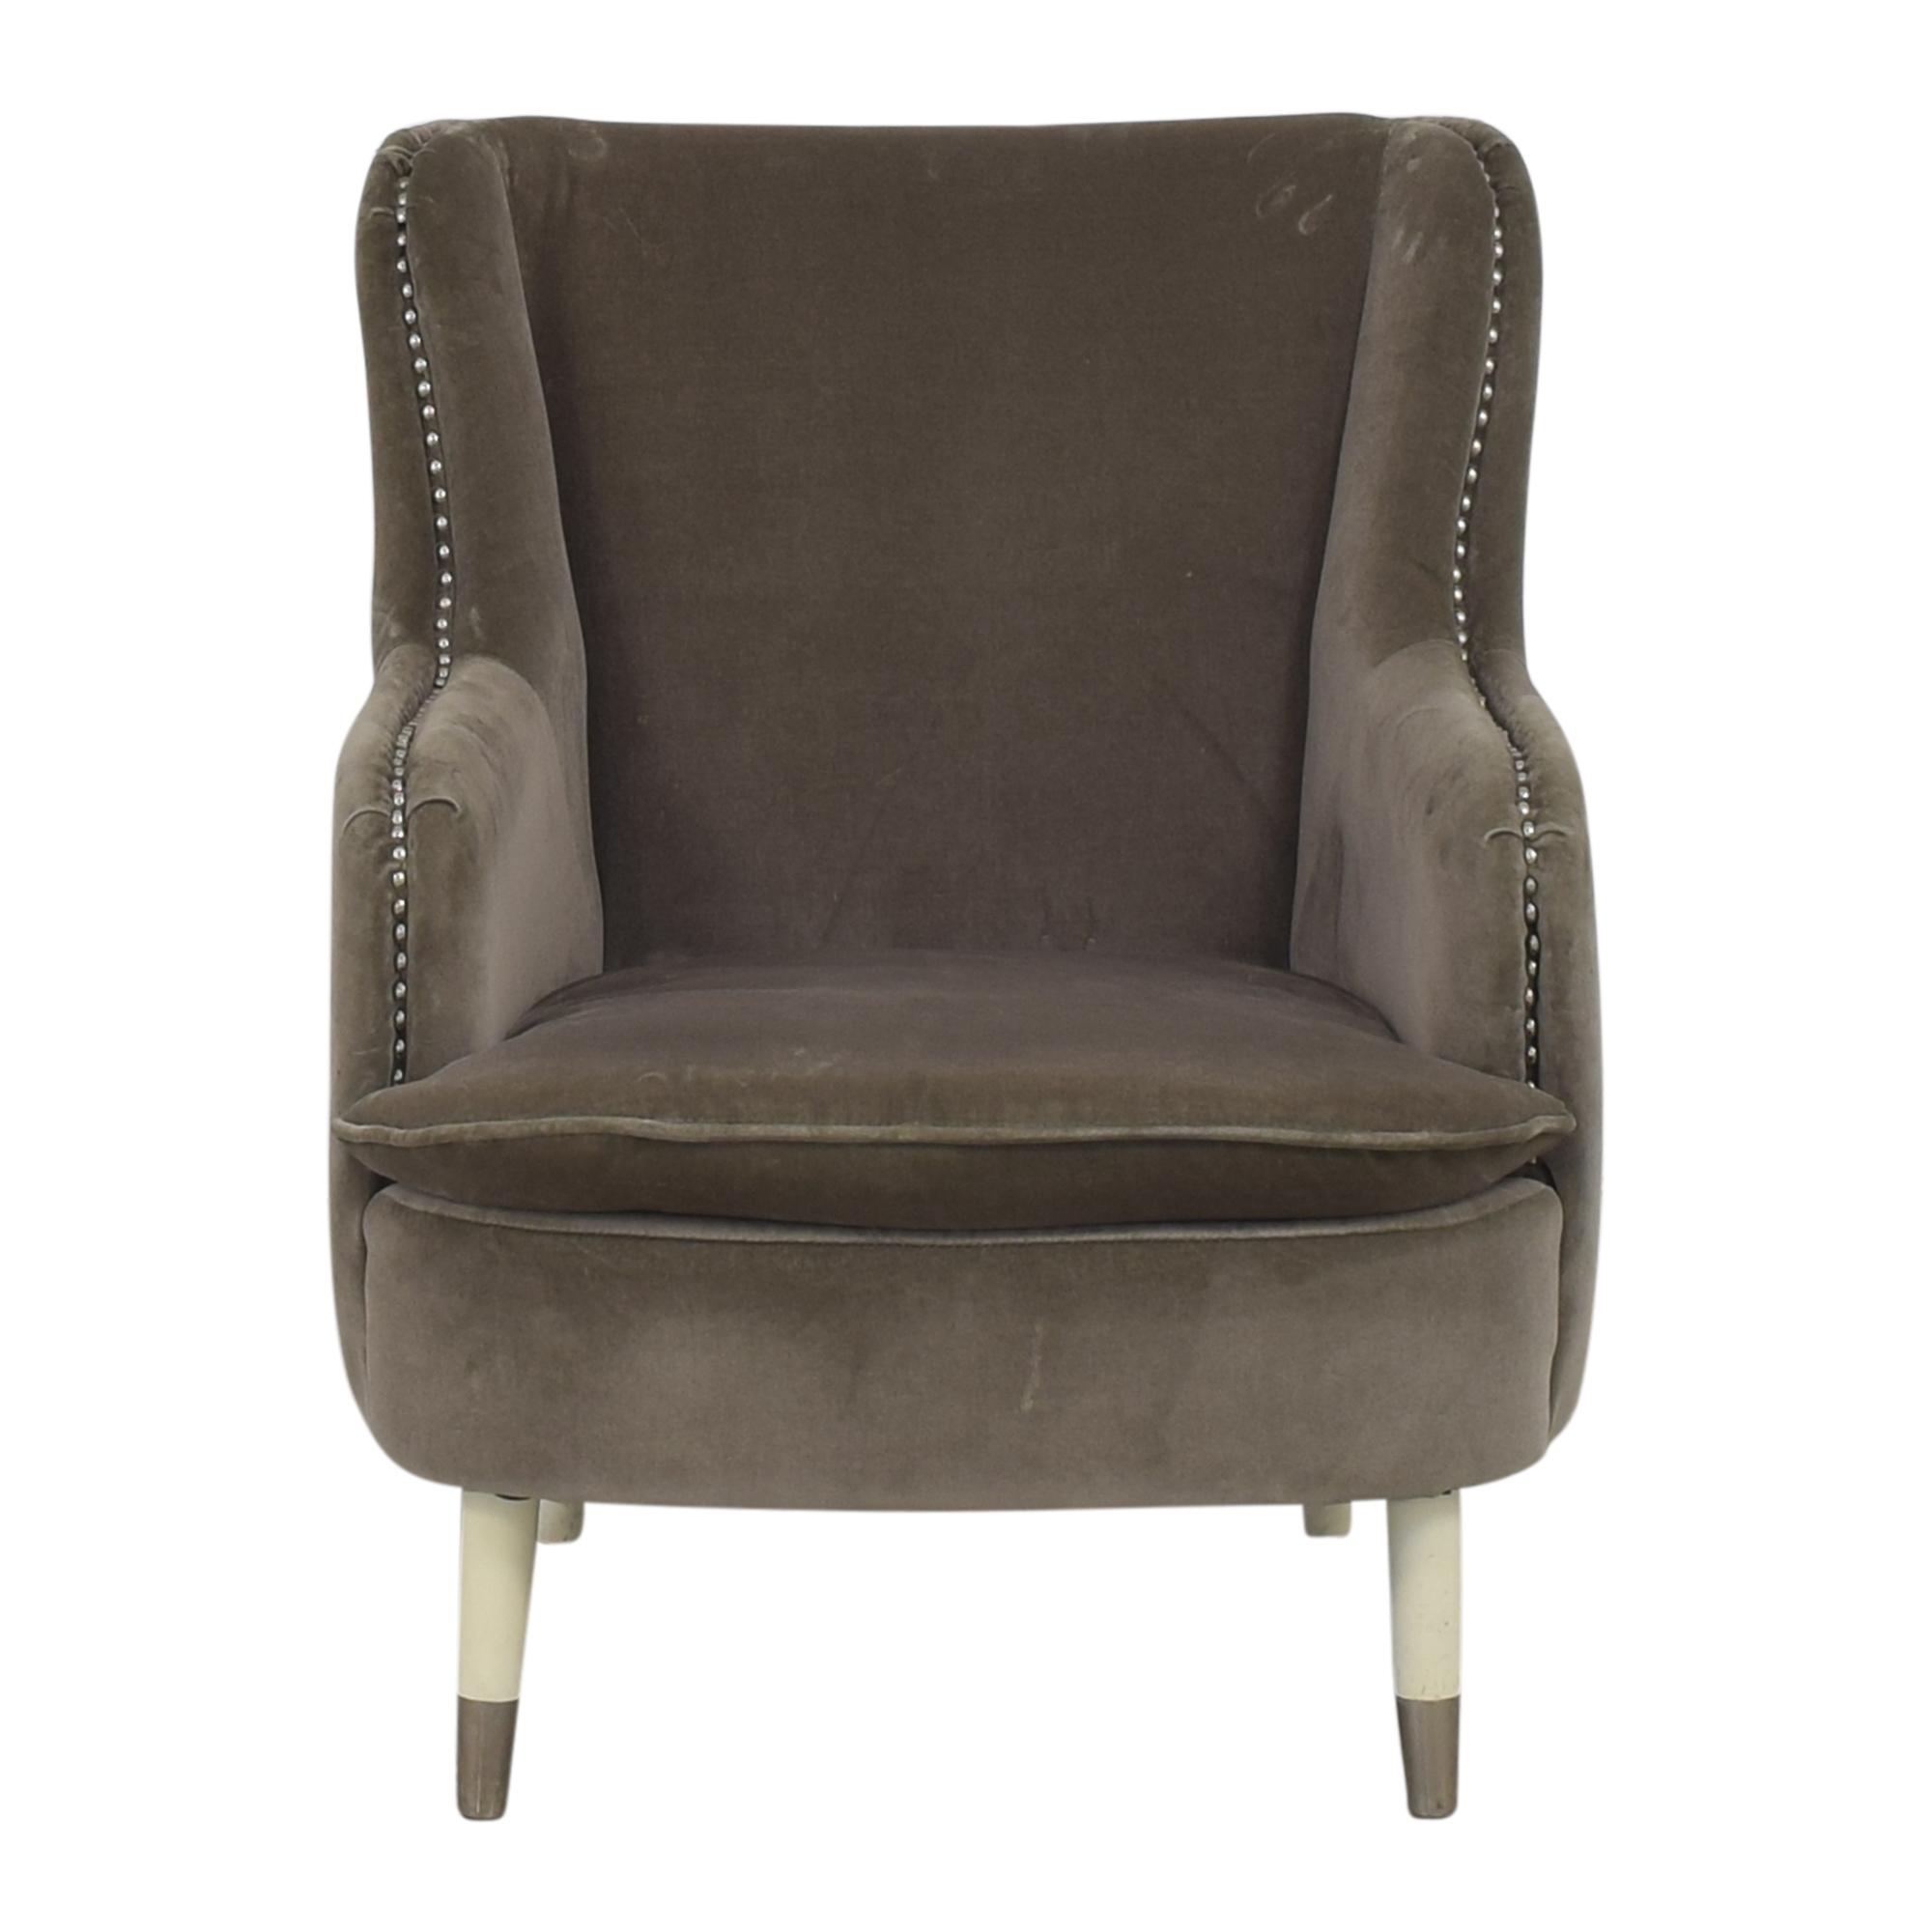 Jonathan Adler Jonathan Adler Nailhead Lounge Chair pa